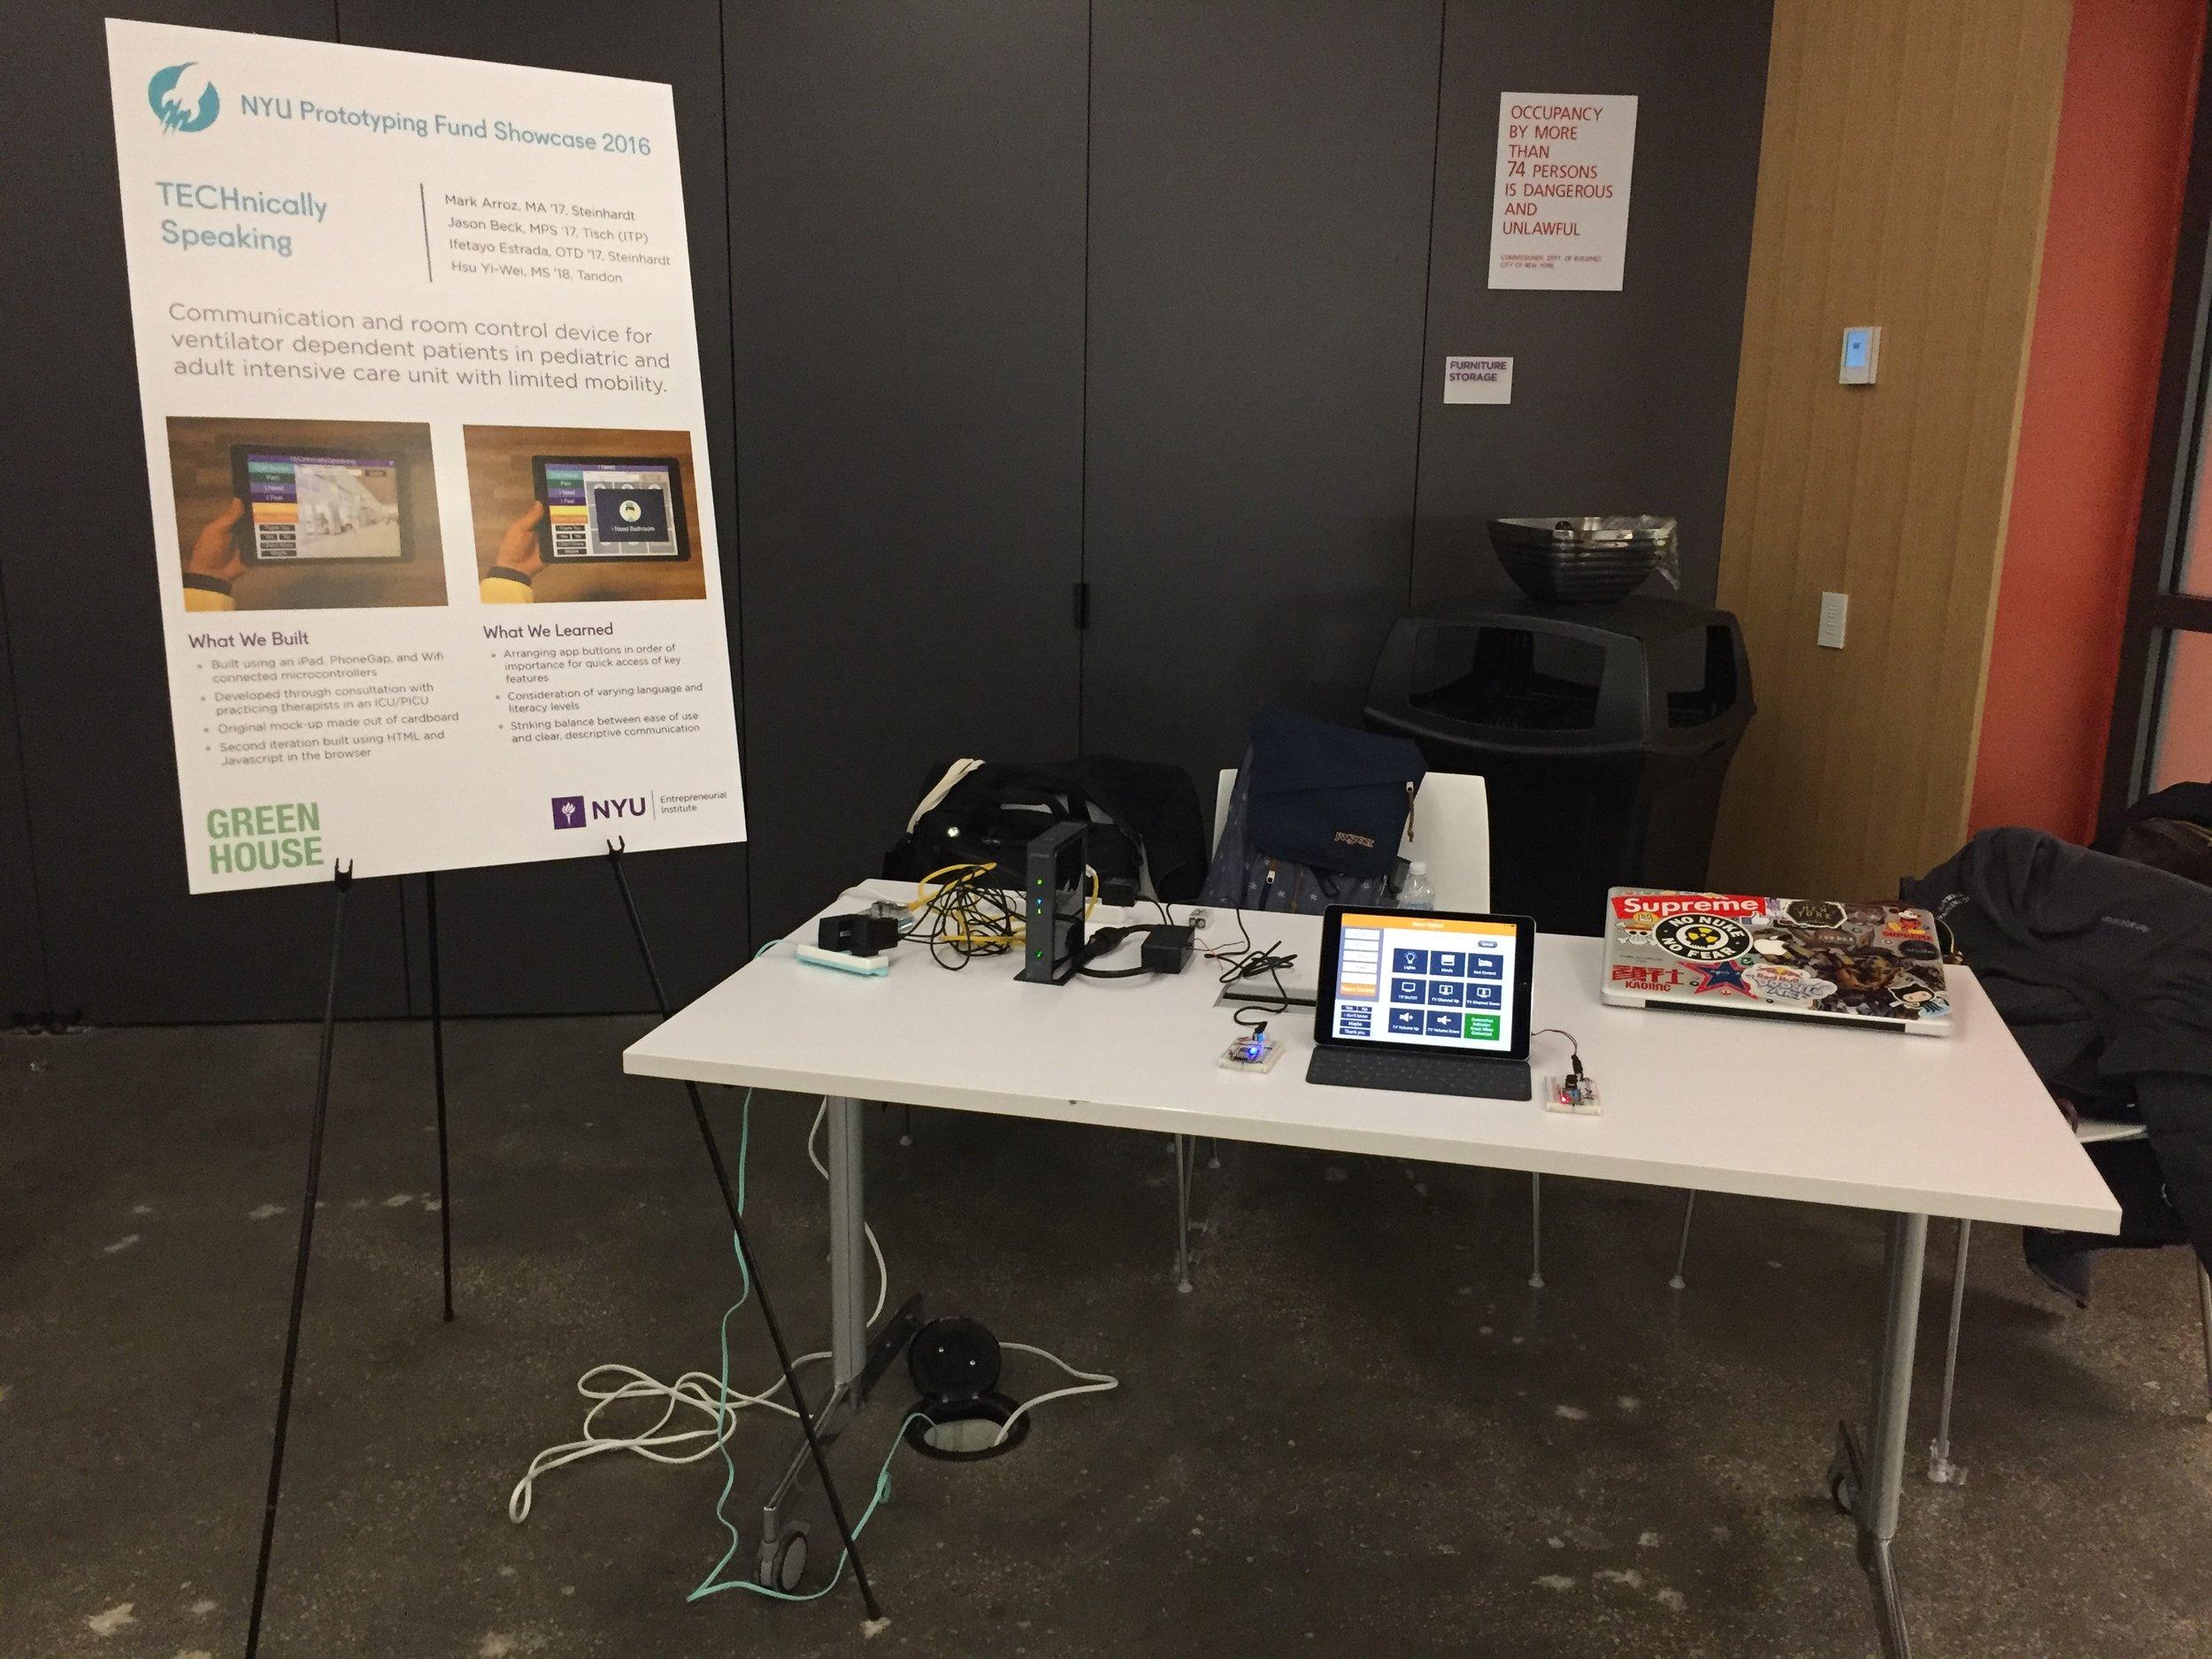 NYU Prototyping Fund Showcase 2016 @ NYU Tandon School of Engineering Maker Space